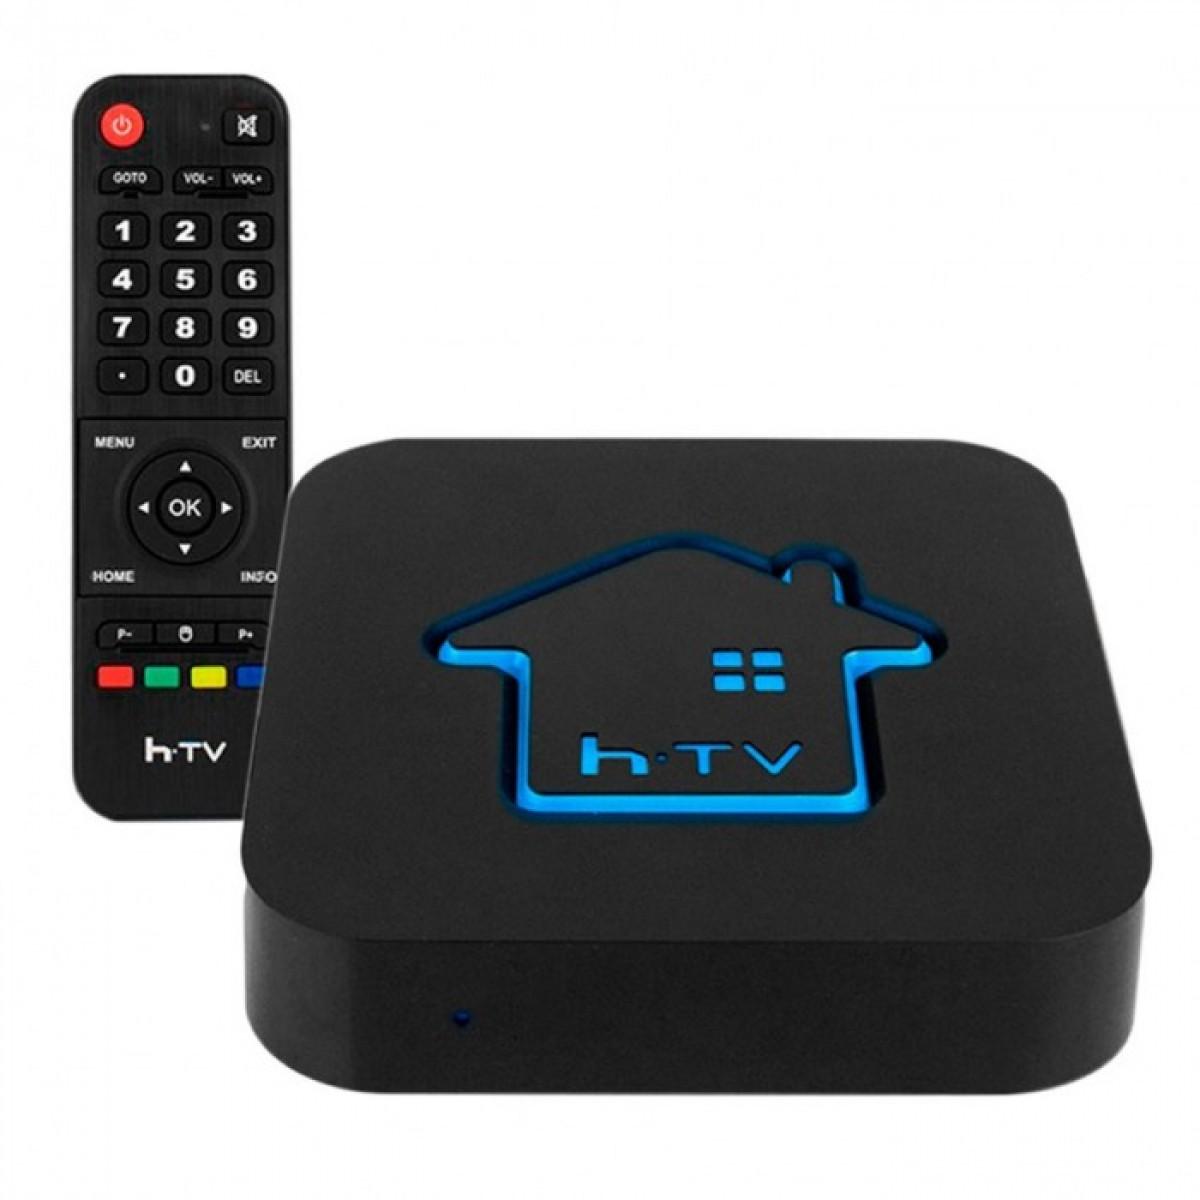 HTV Black